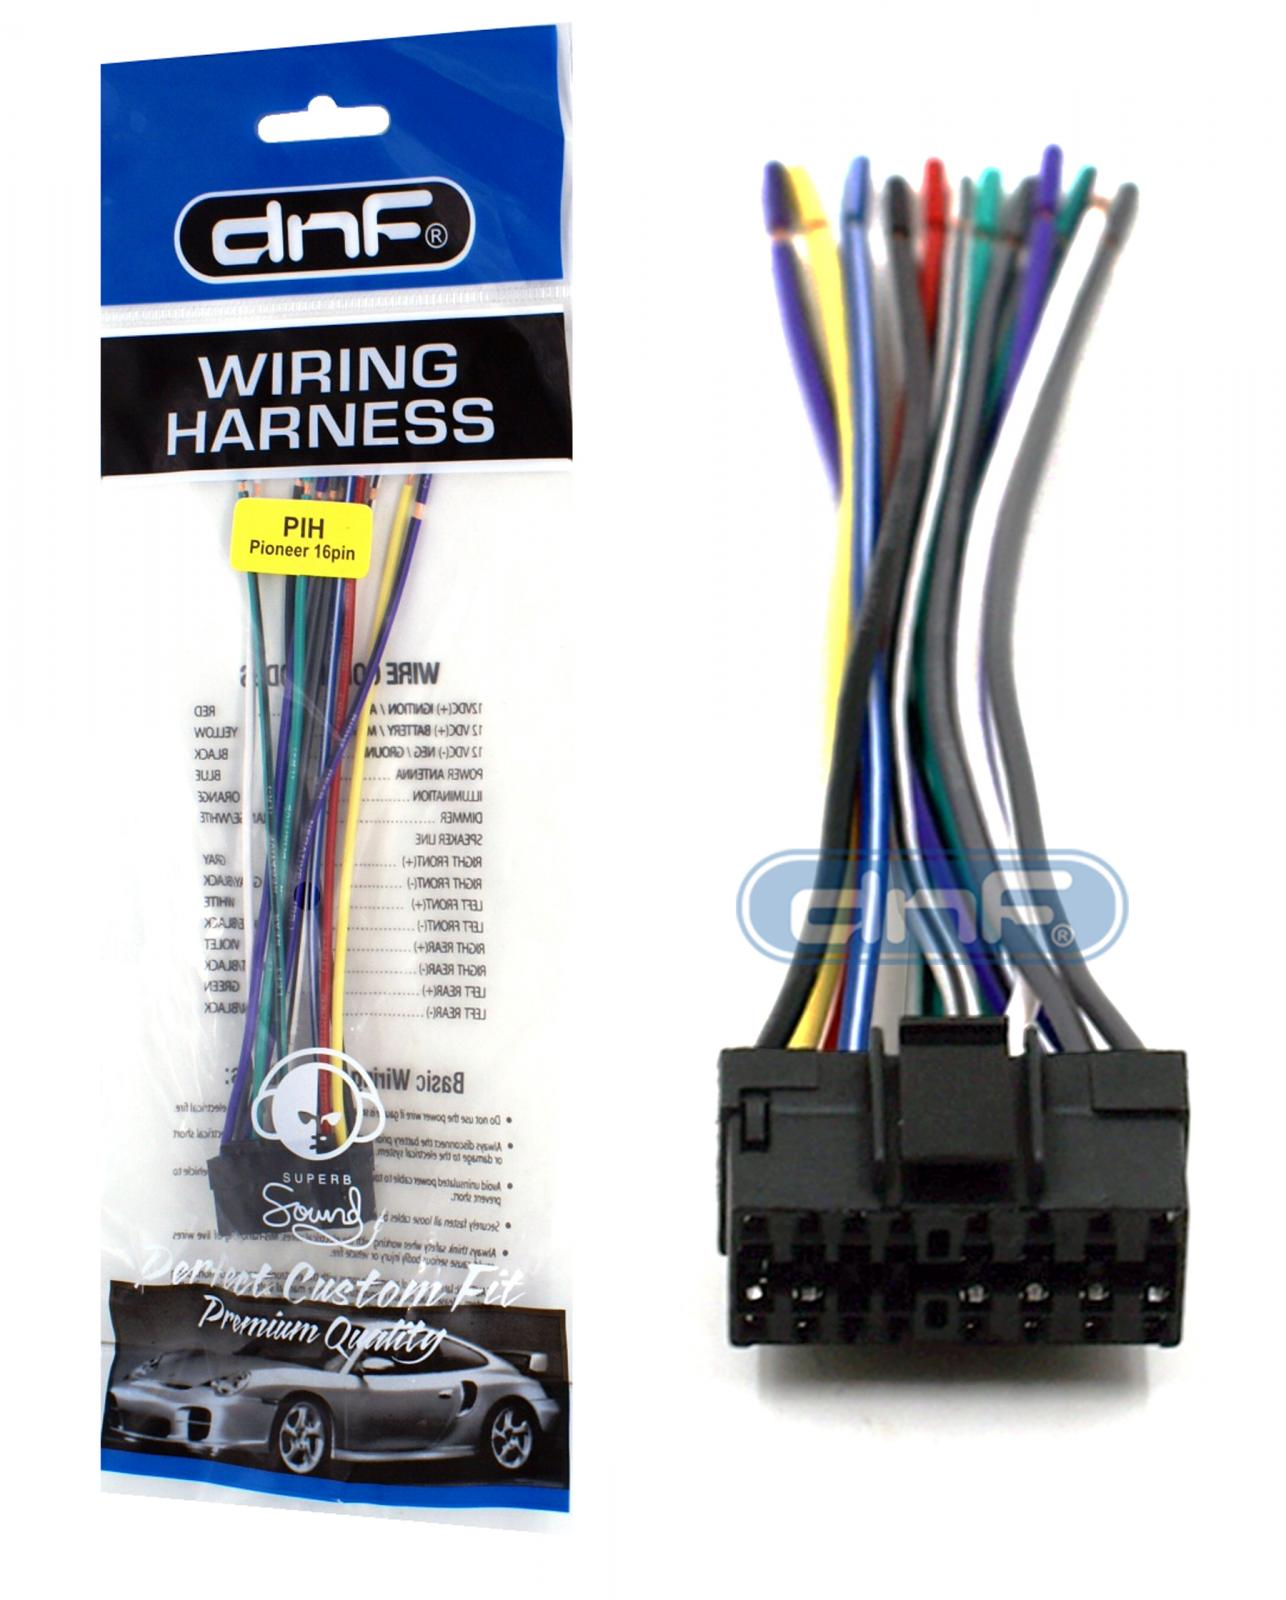 PIH listing pic?versionId=Ty5CJ2N7LTRG2FN7p2F1DZw0_774hcQ. pioneer deh 1100 deh 1150 deh 2100 deh 2150 wiring harness ships pioneer 16 pin wiring harness at creativeand.co